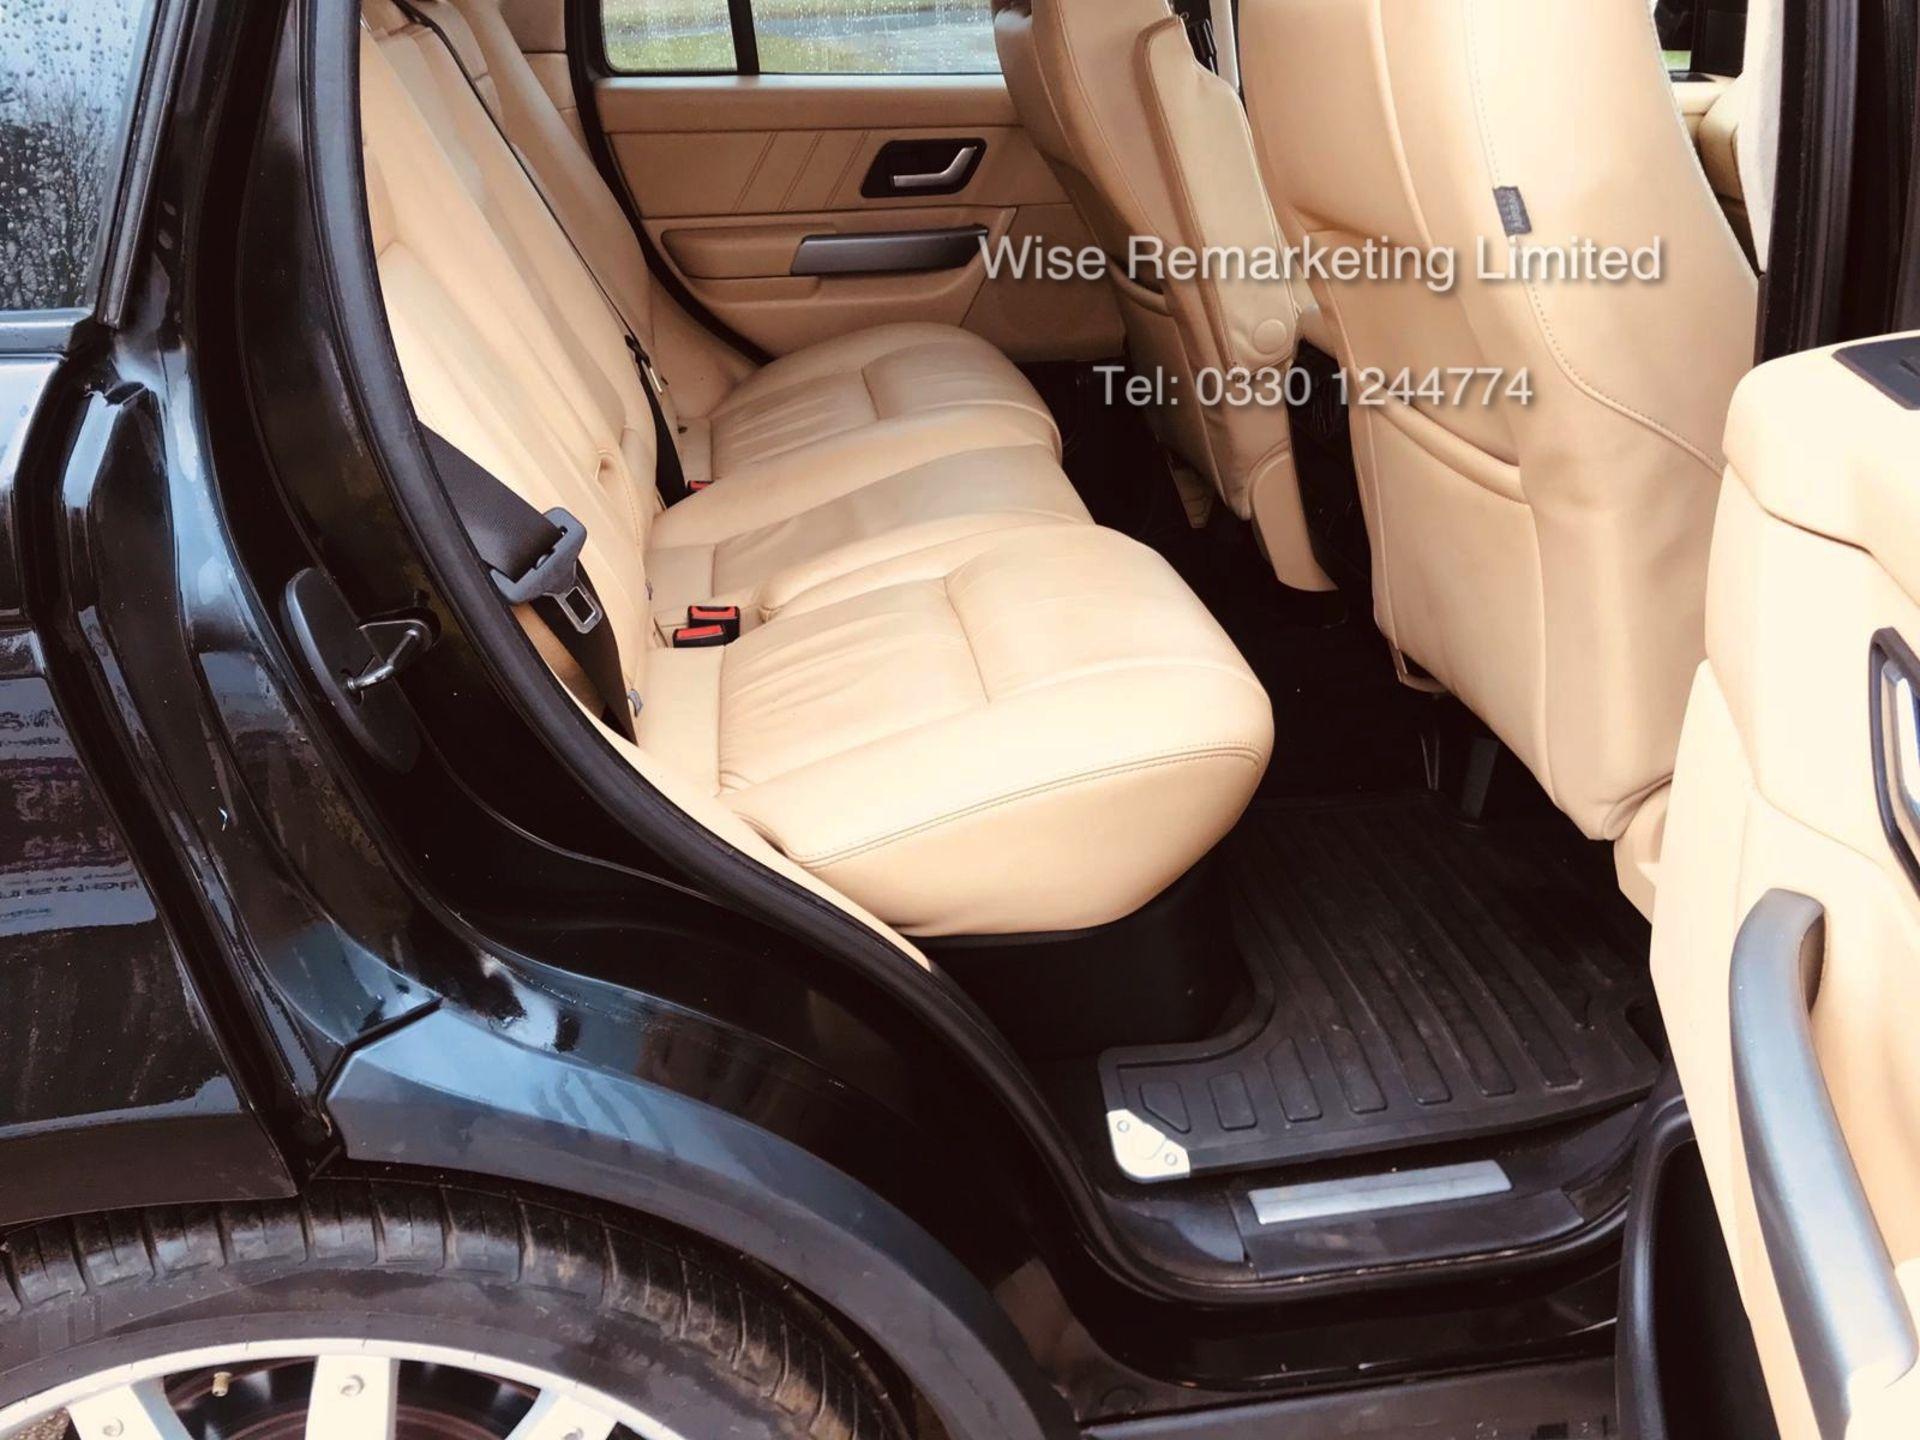 Range Rover Sport 2.7 TDV6 HSE Auto - 2008 Model - Cream Leather - Sat Nav - Heated Seats - Image 6 of 19